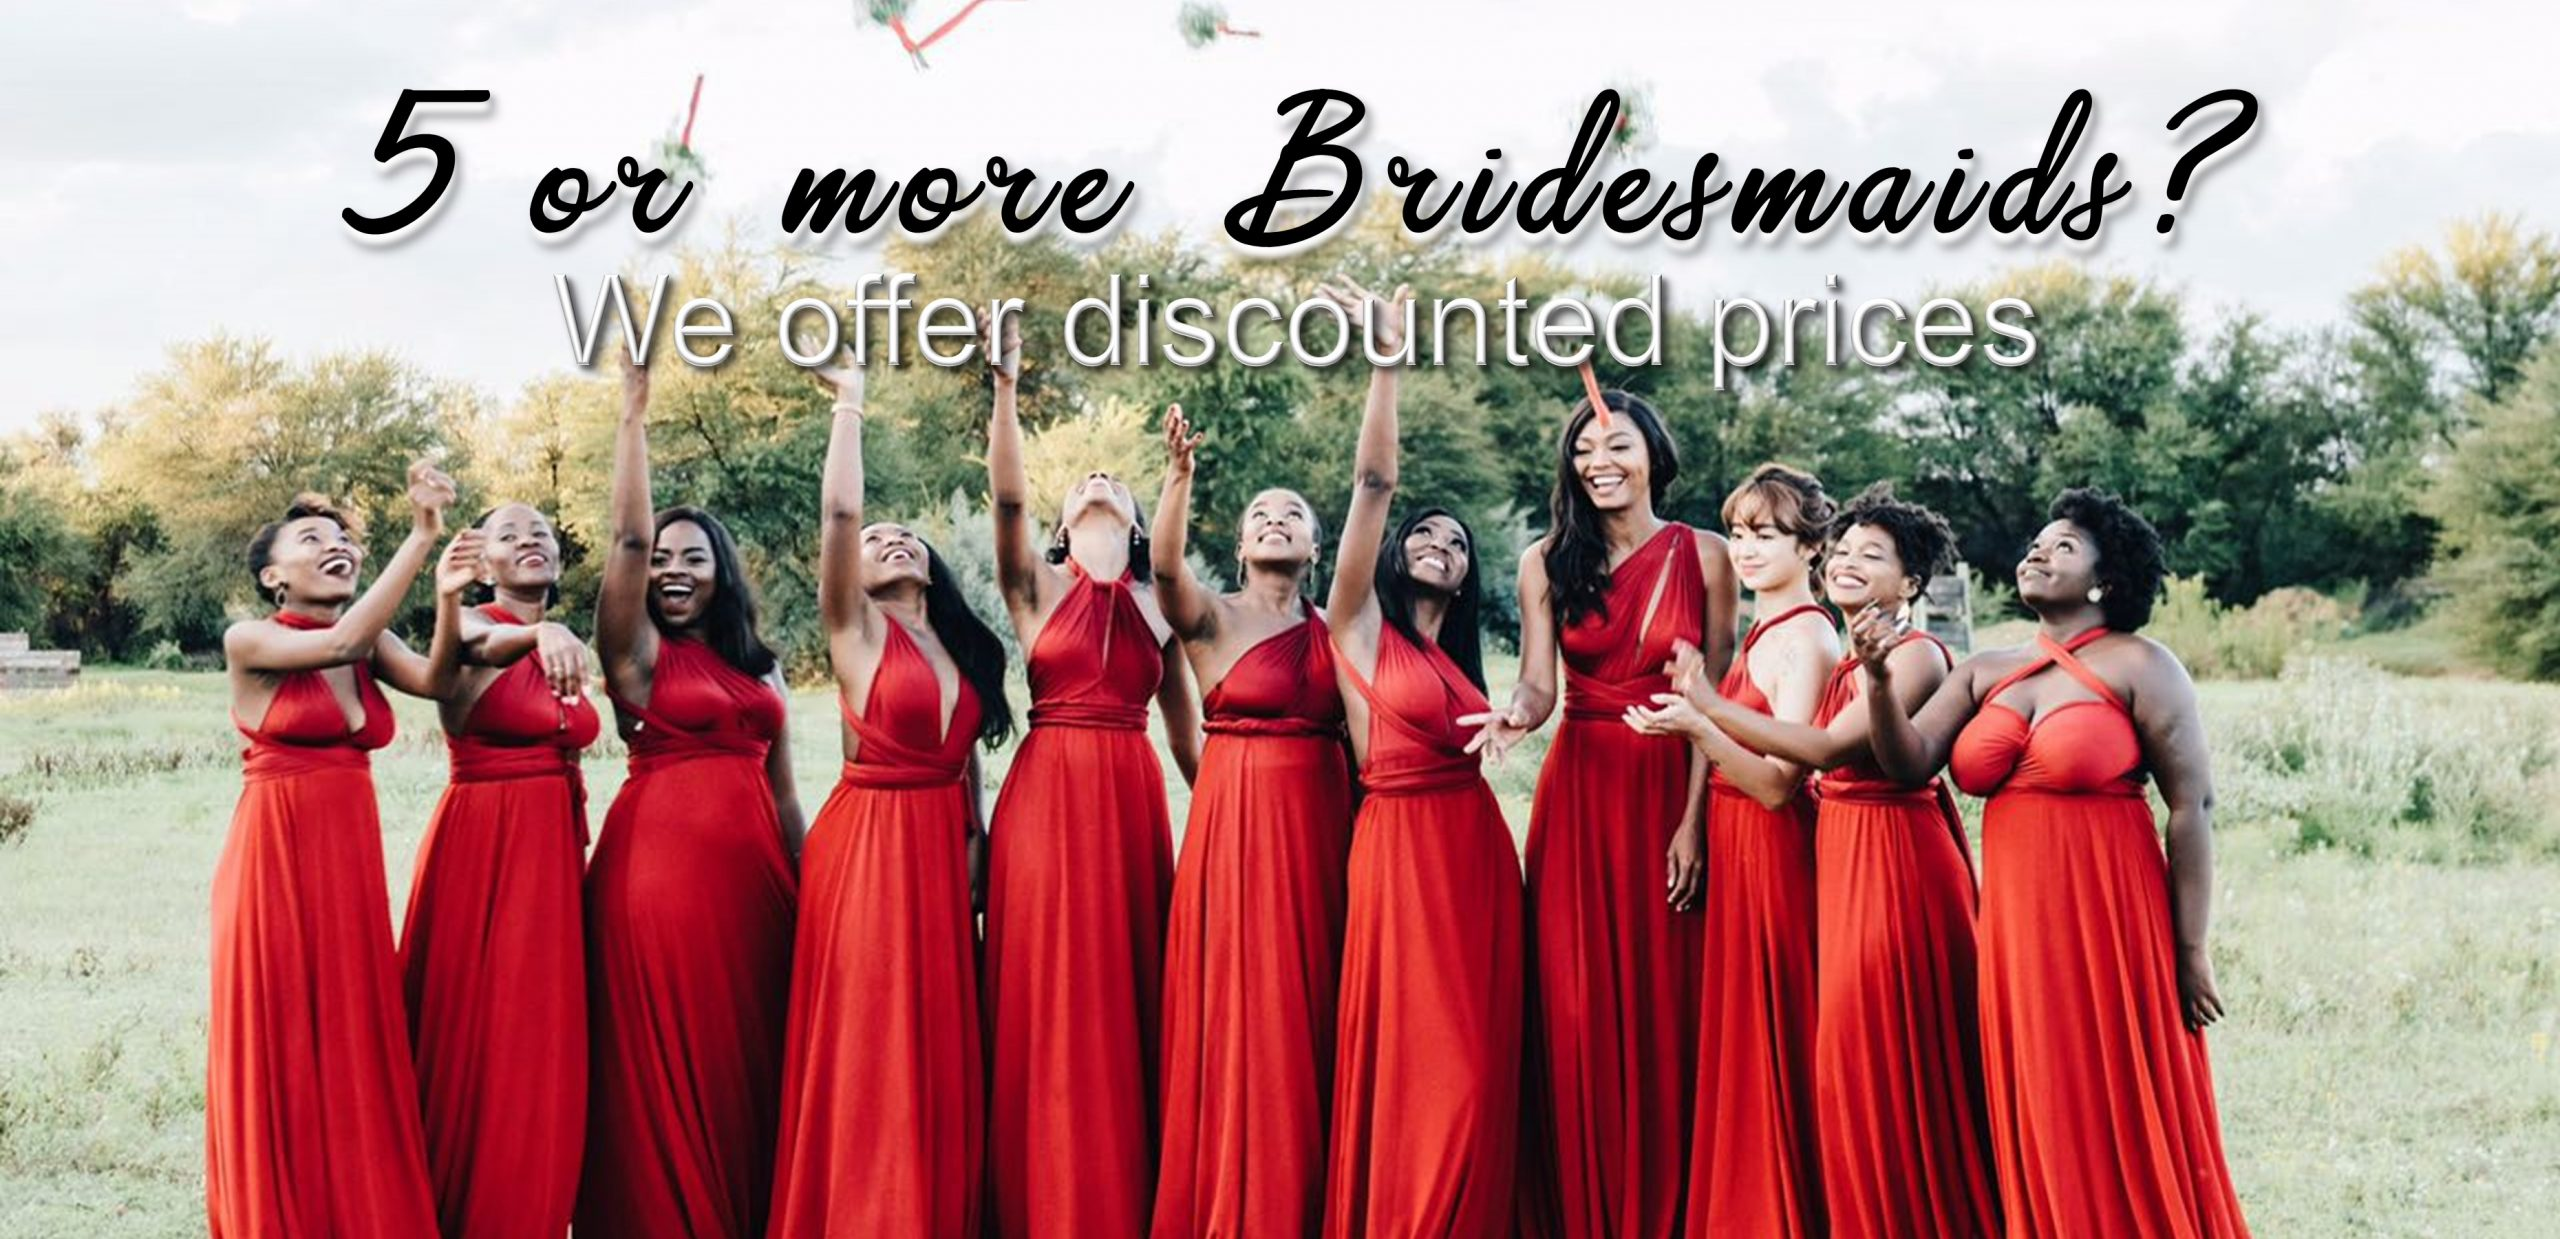 5 or more Bridesmaid dresses?